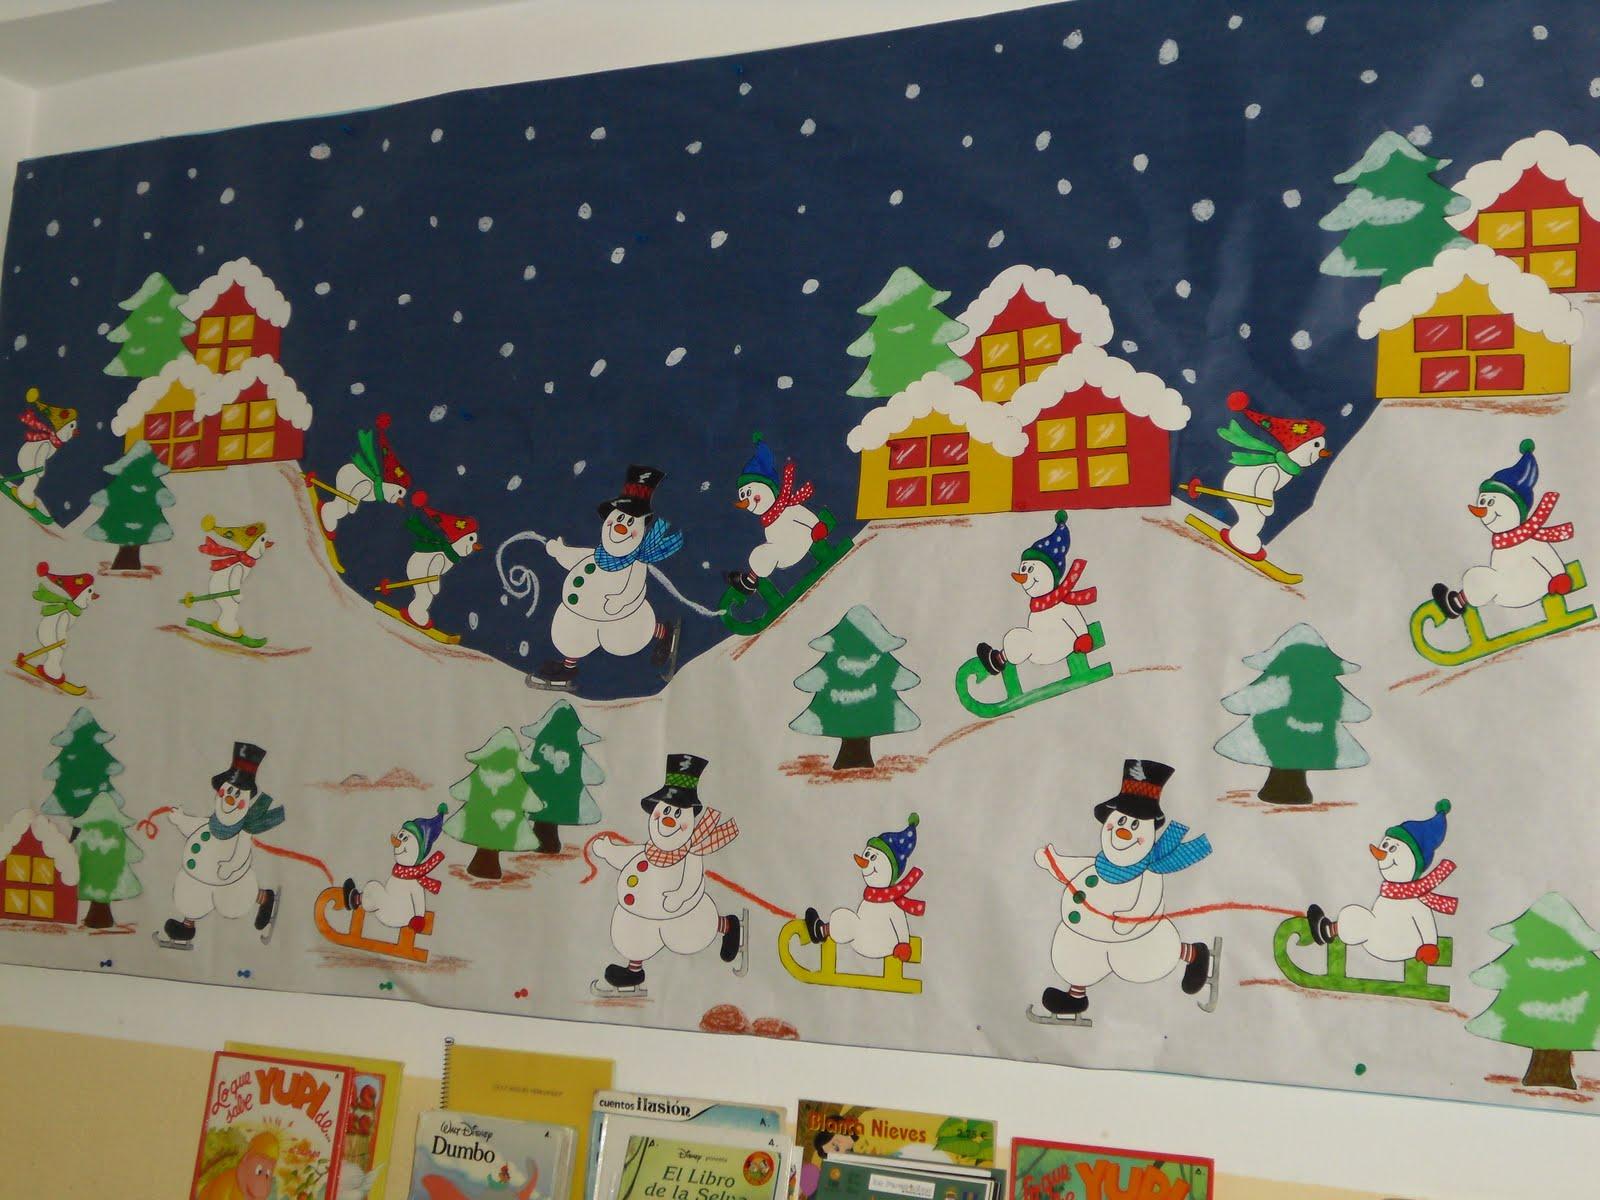 La revista del miguel hern ndez marzo 2011 - Mural navidad infantil ...